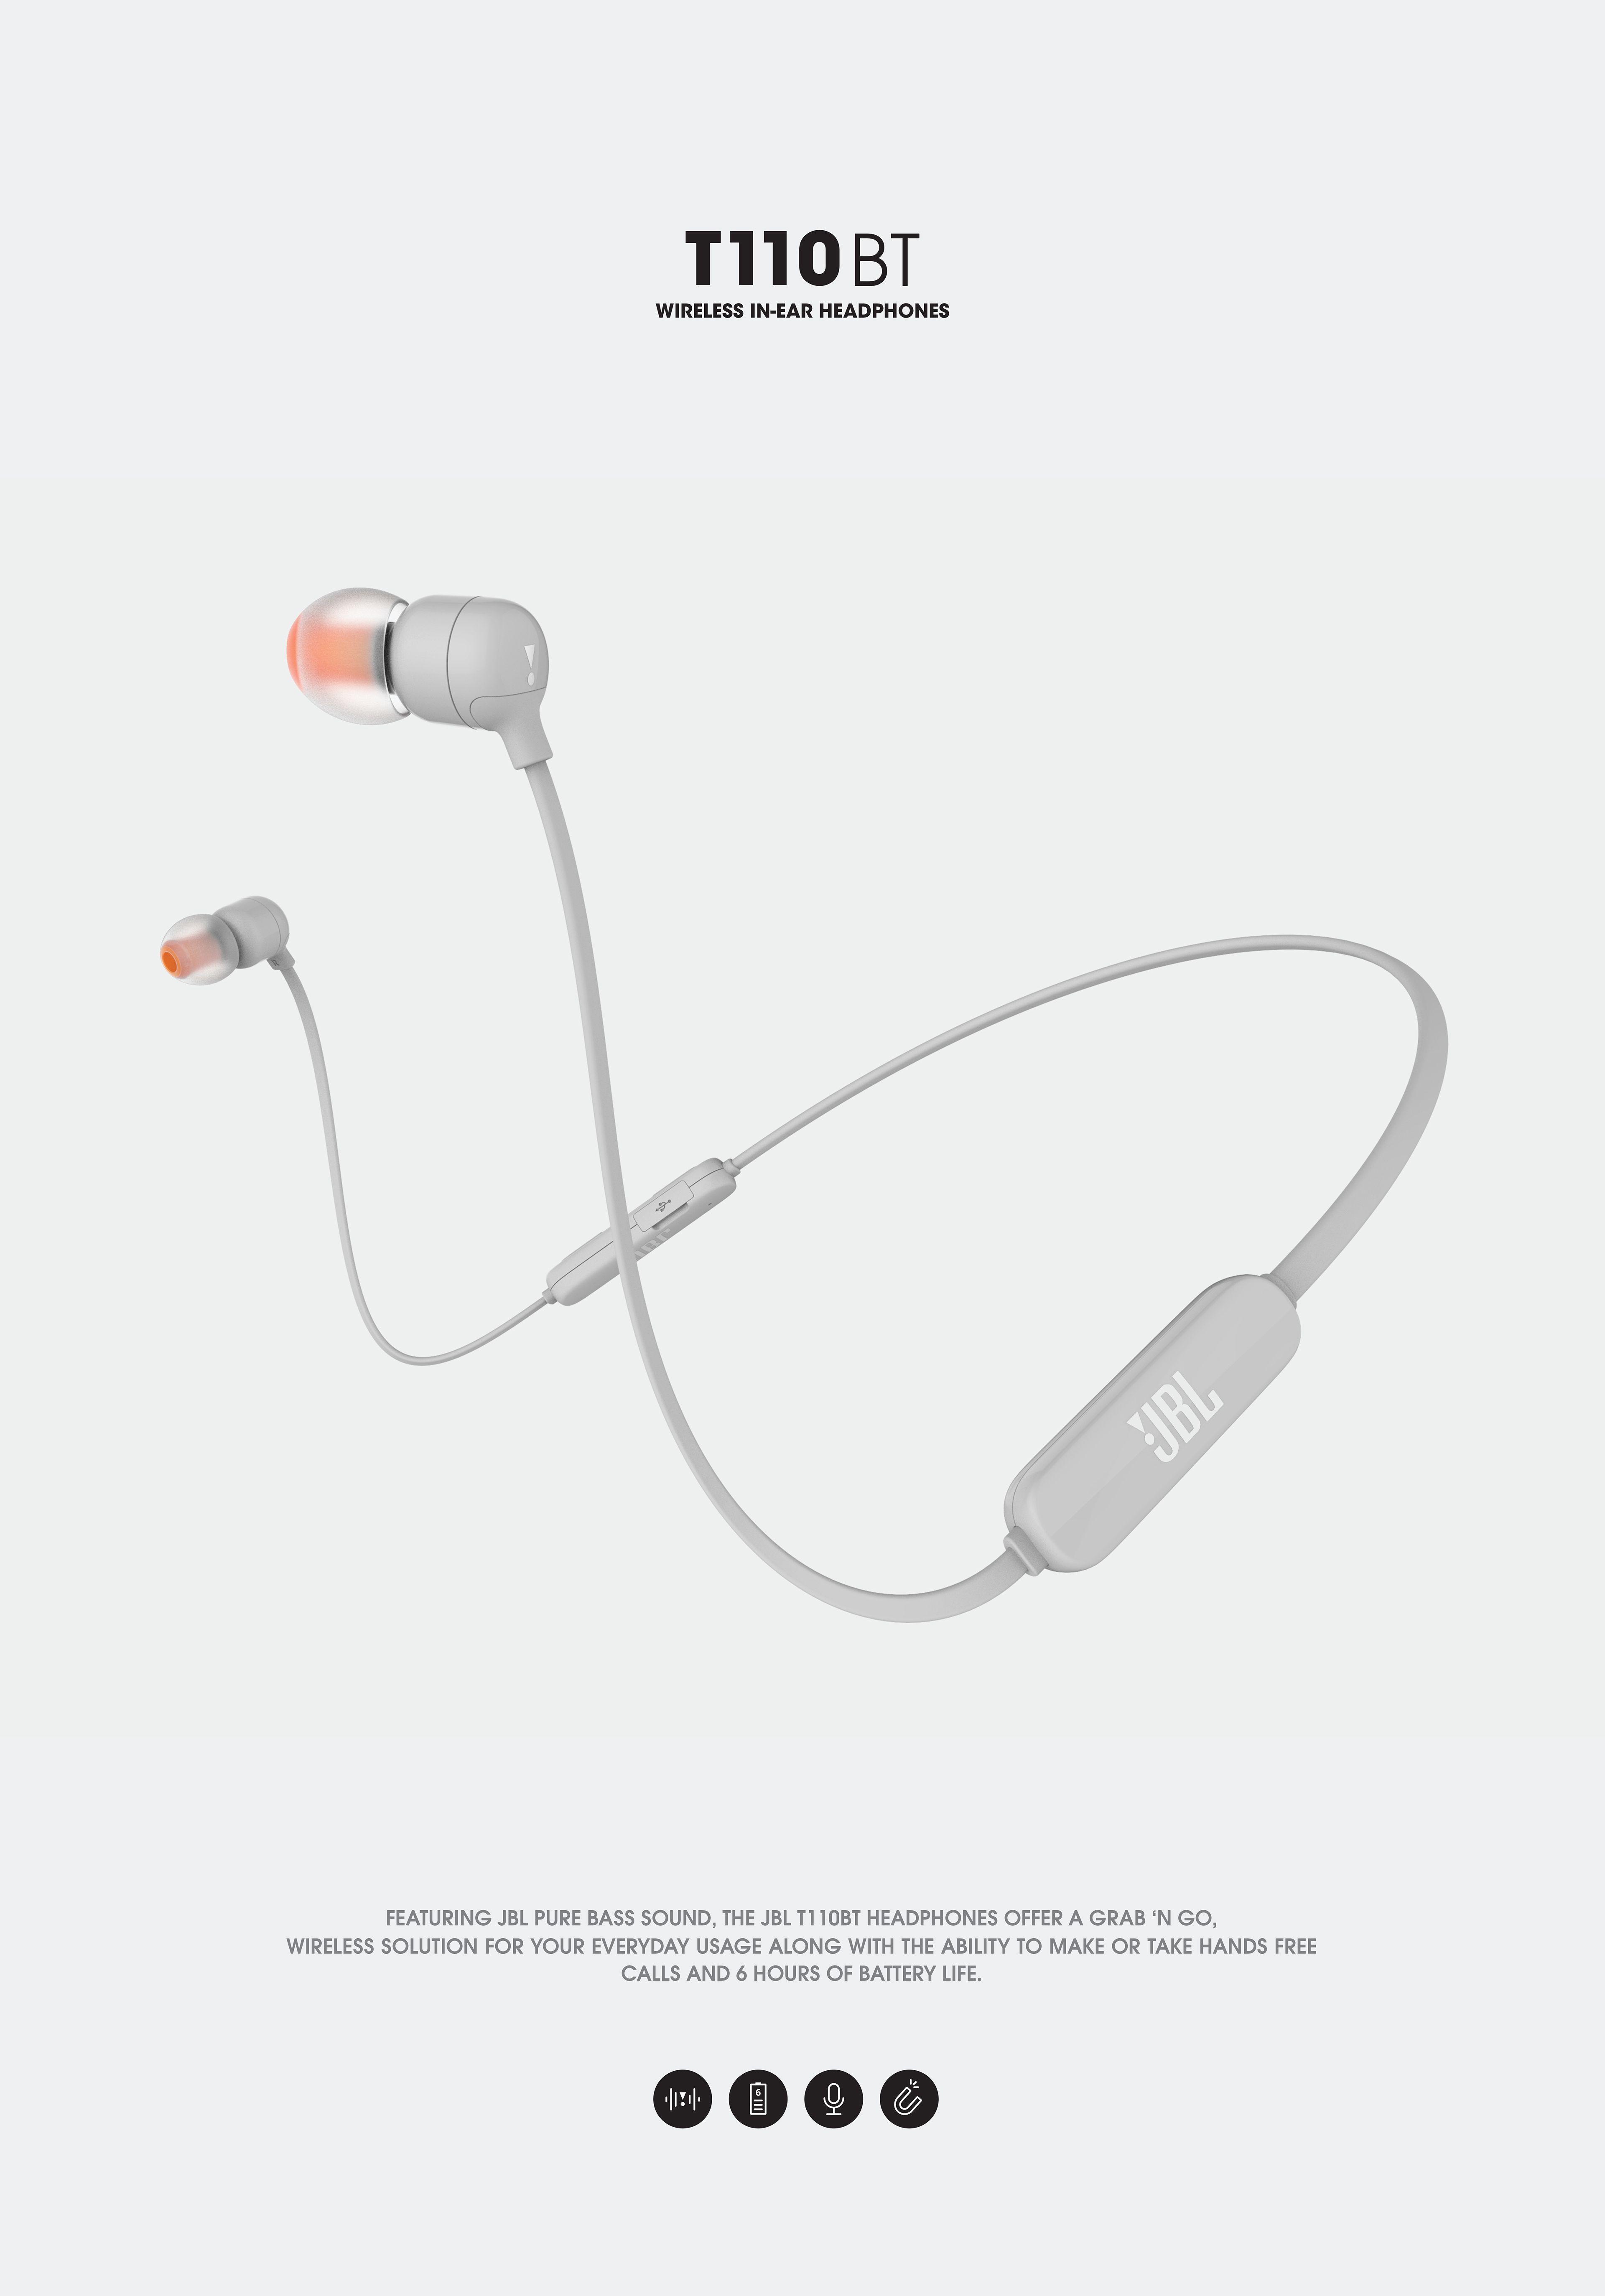 Jbl Bluetooth Headphones T110bt On Behance